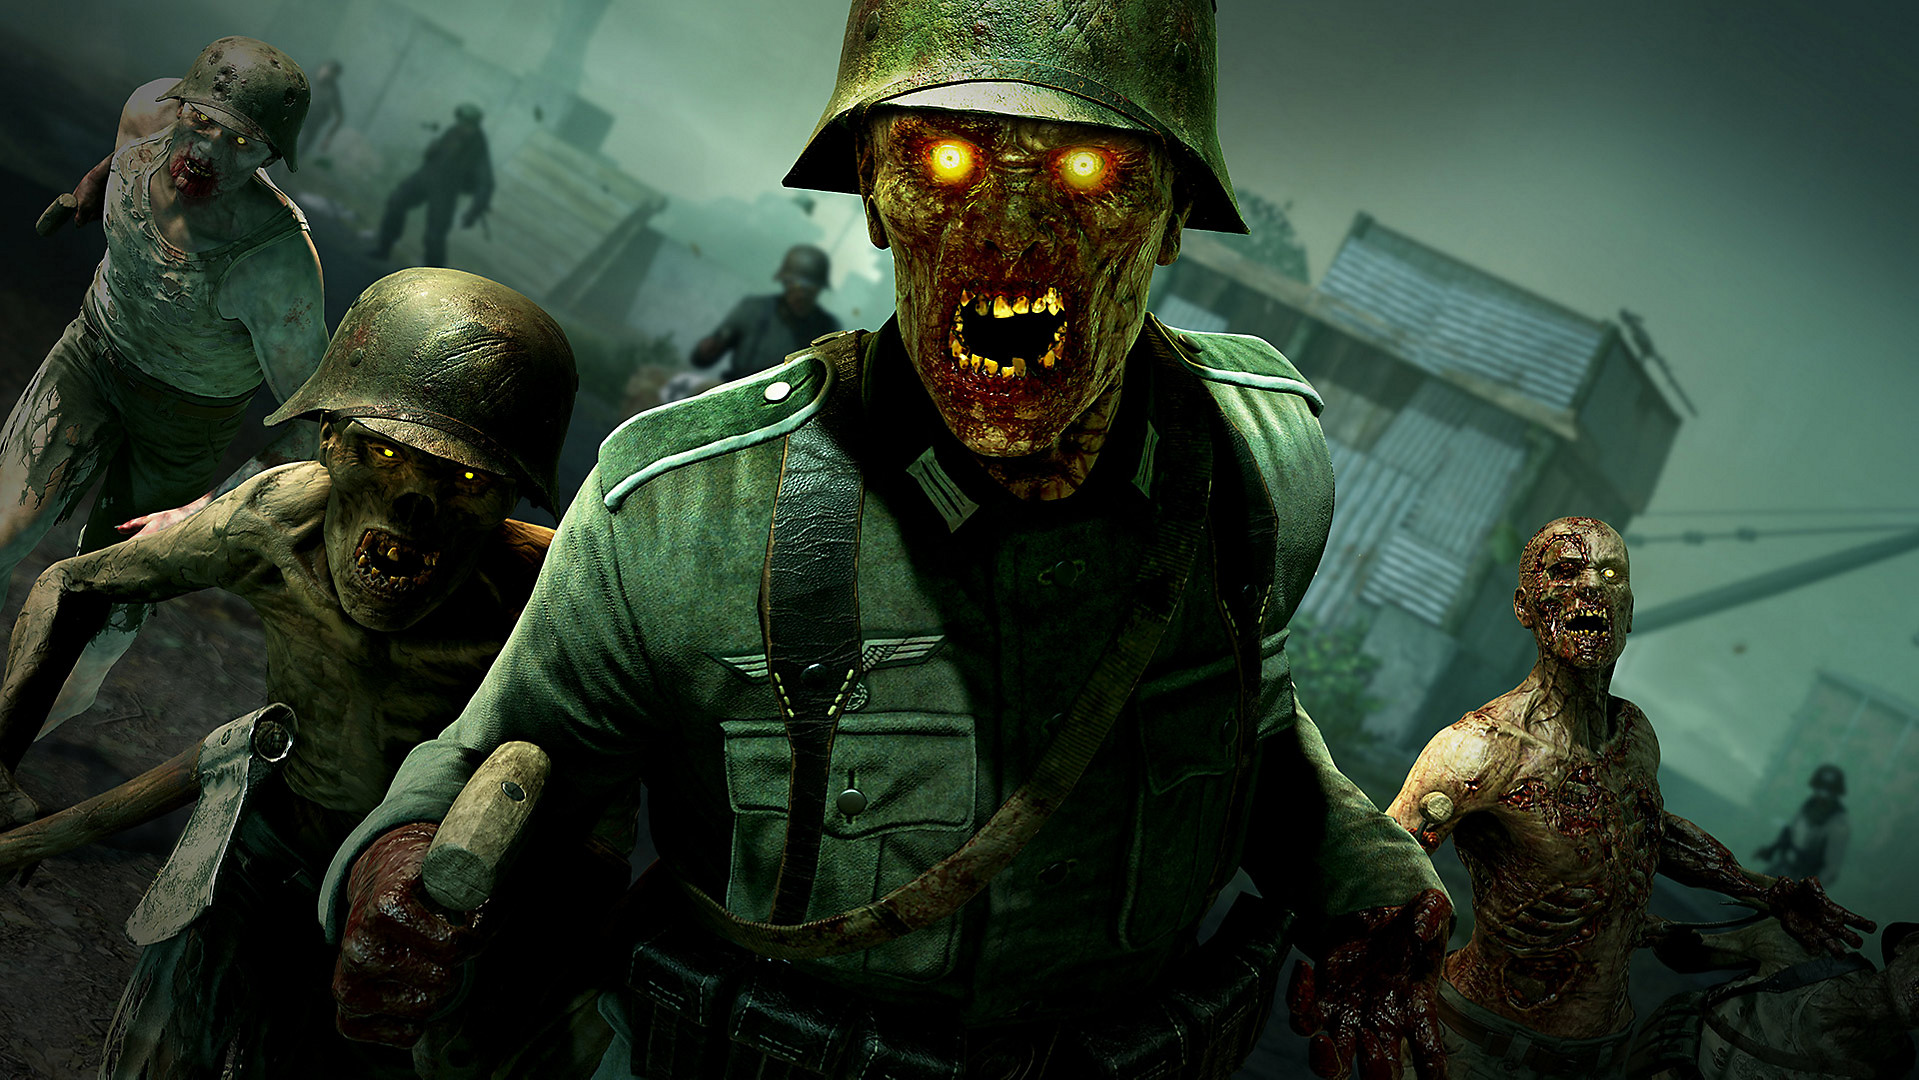 zombie-army-4-dead-war-screenshot-05-ps4